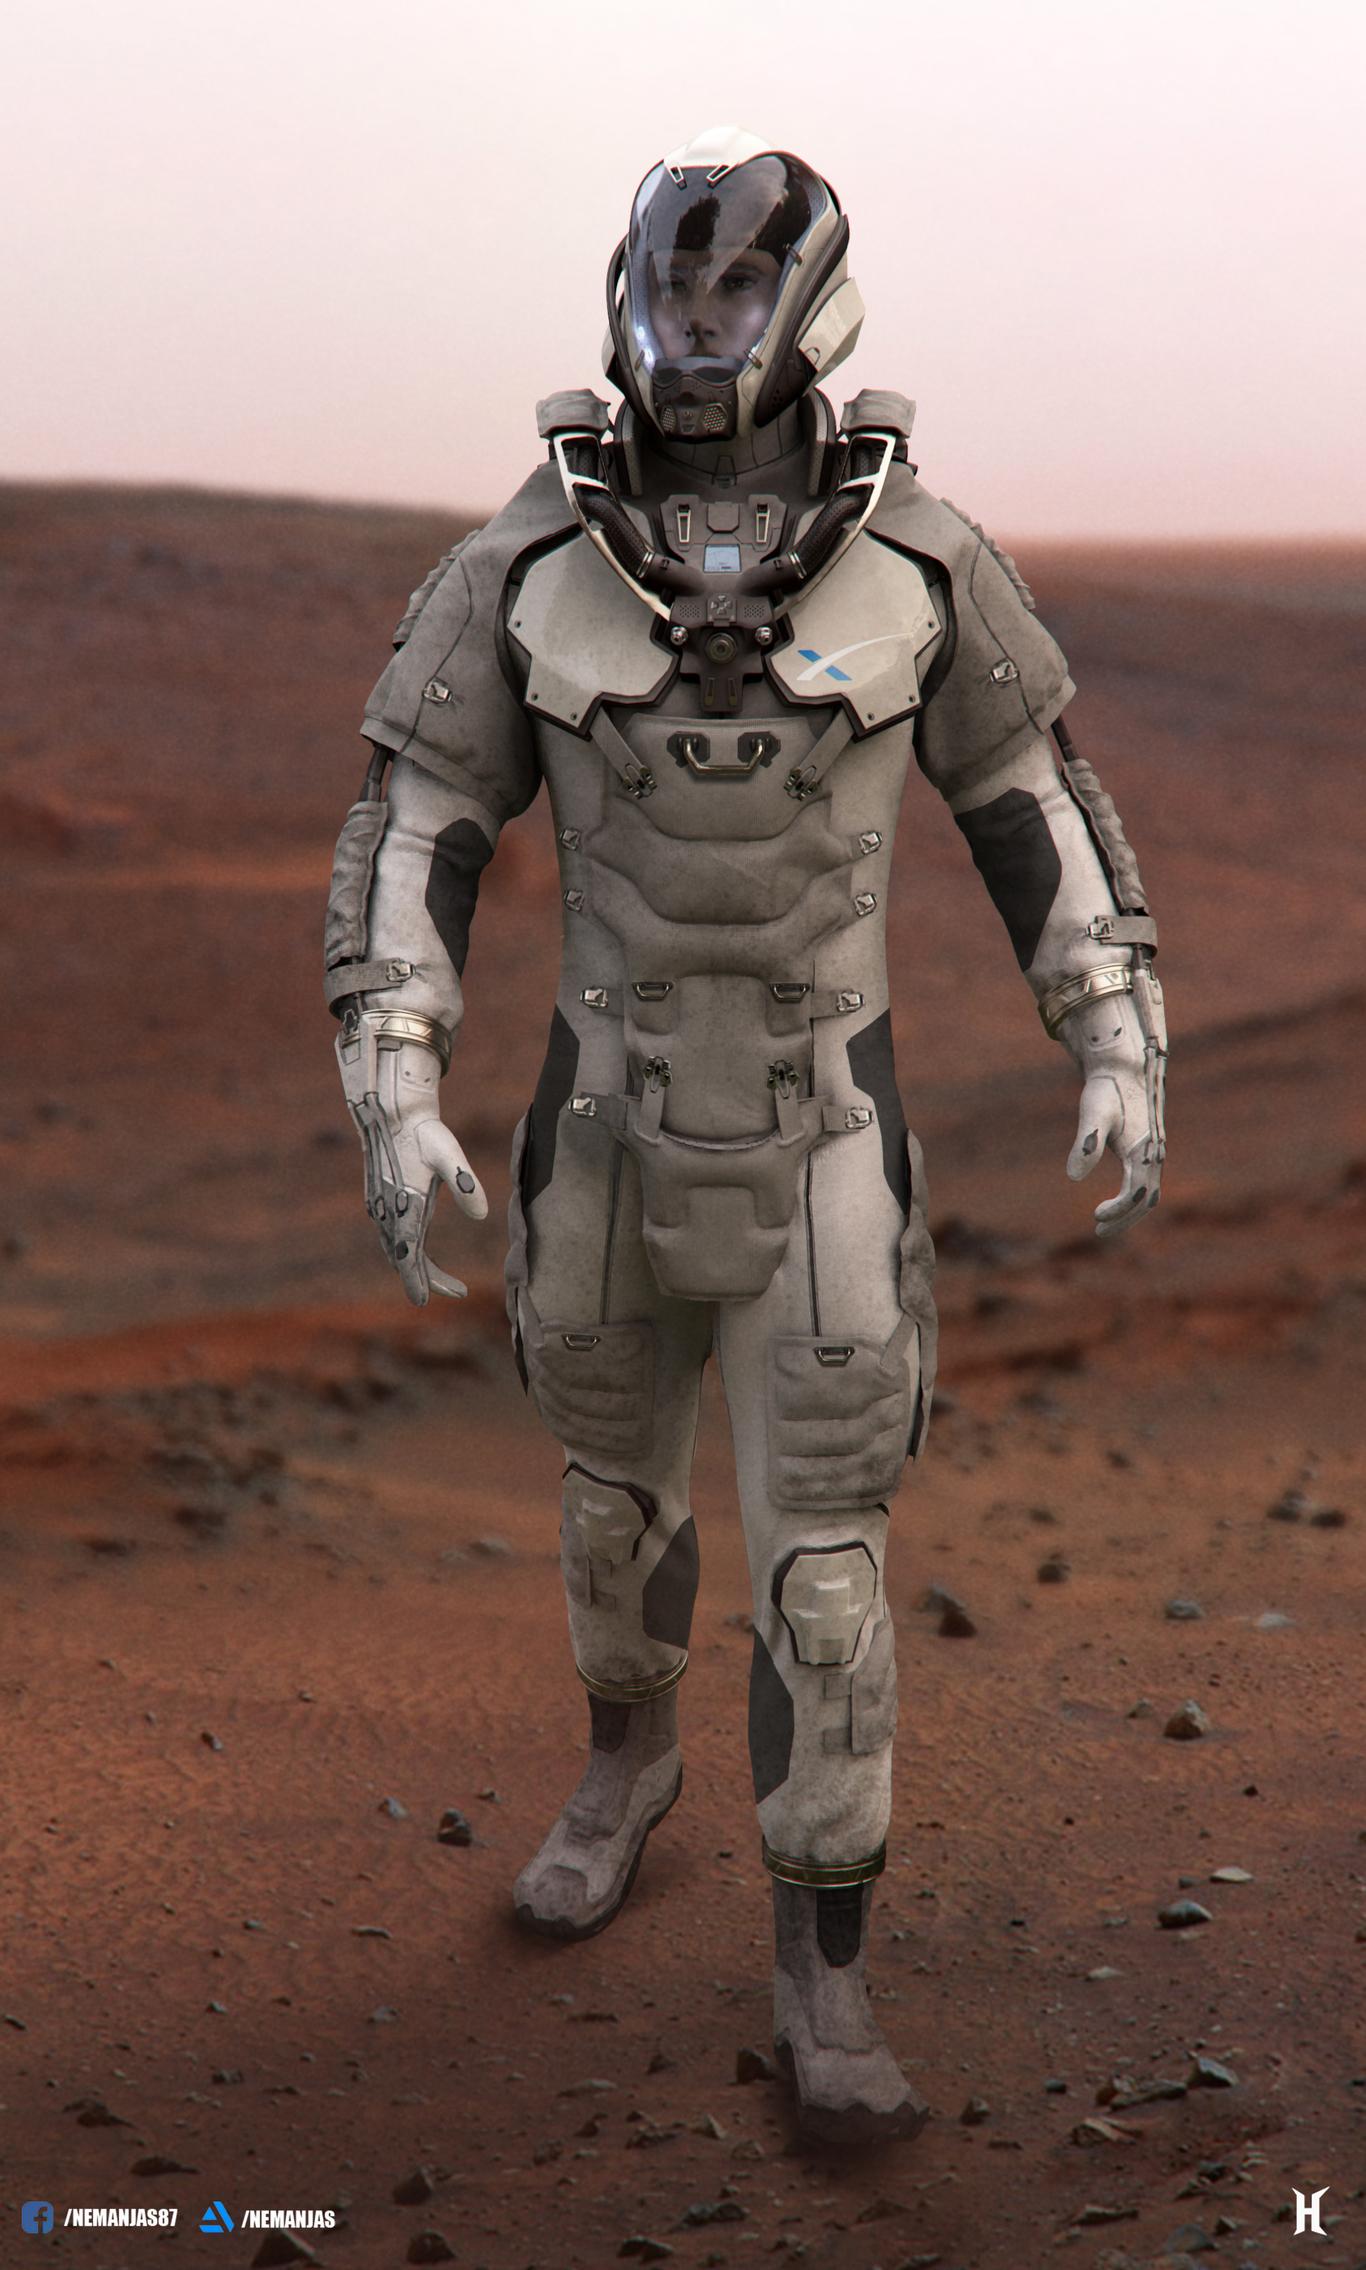 Grizzlybear spacex mars eva suit 1 4f74f067 tuim